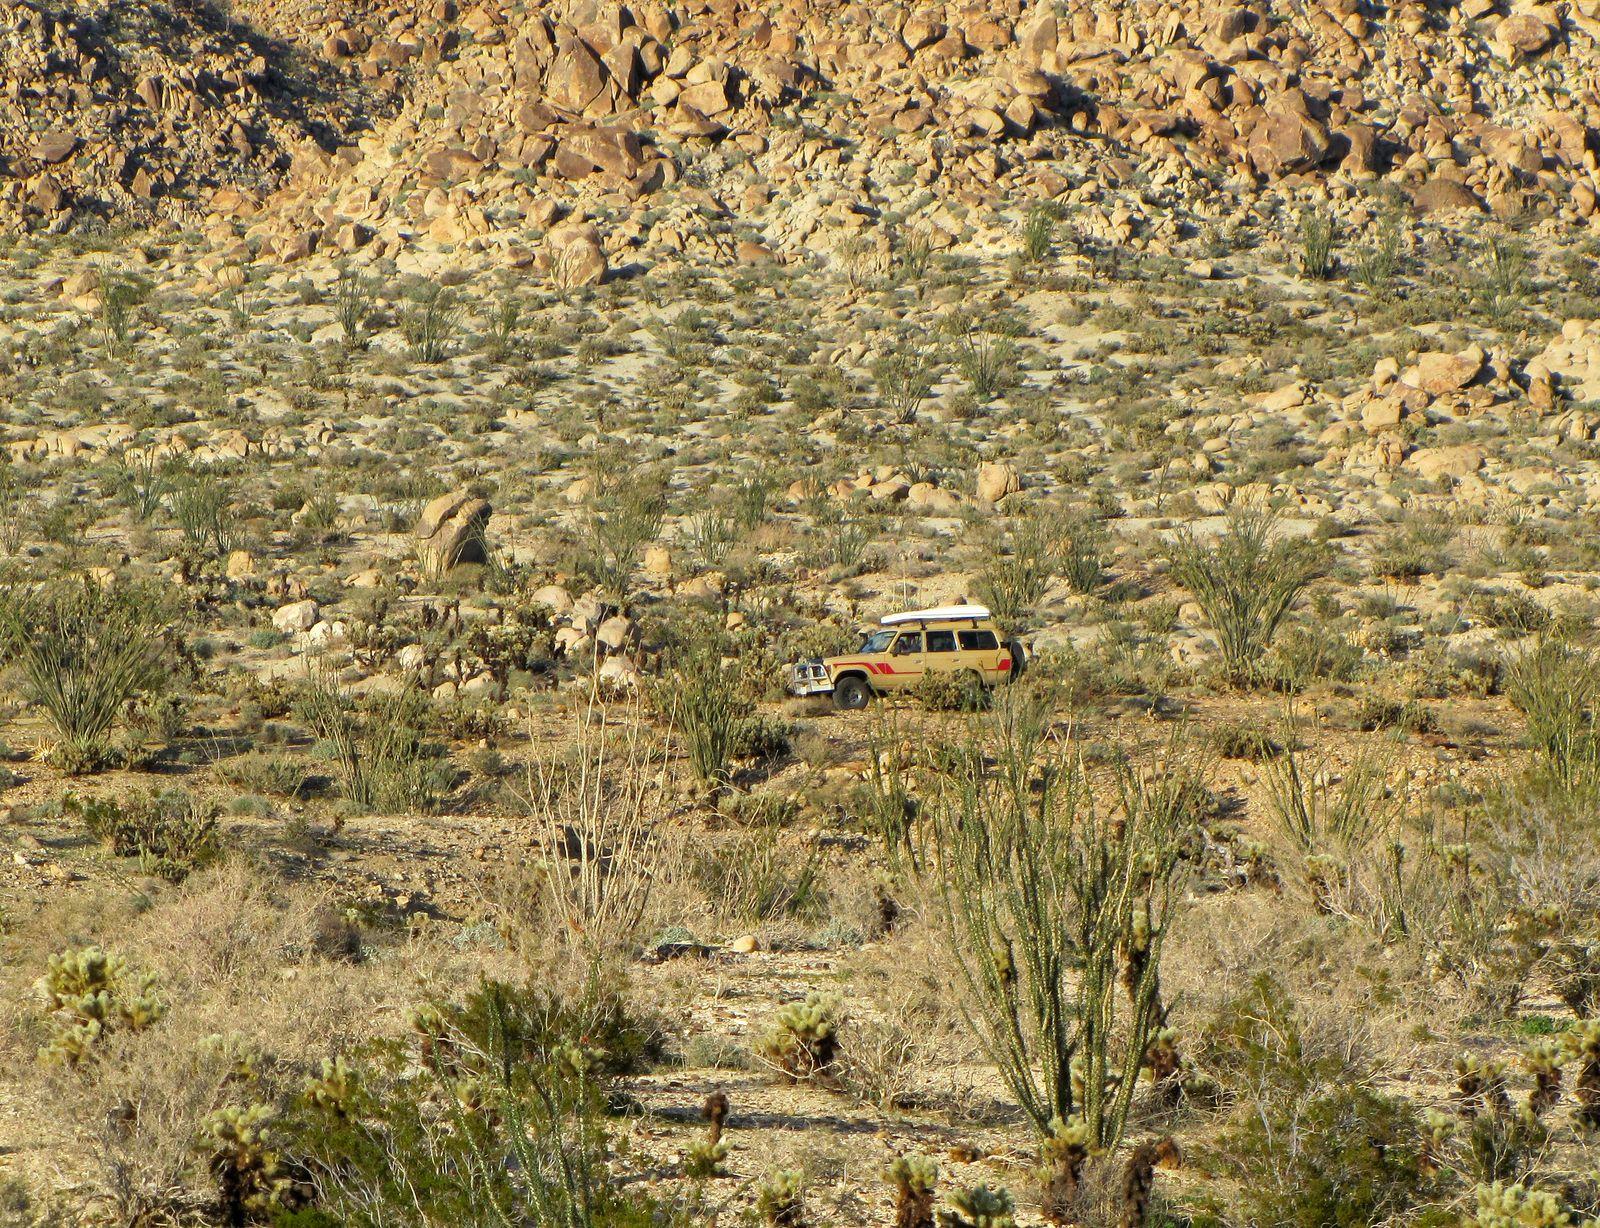 Jan, Gina and Pablo traveling through the Anza Borrego Desert